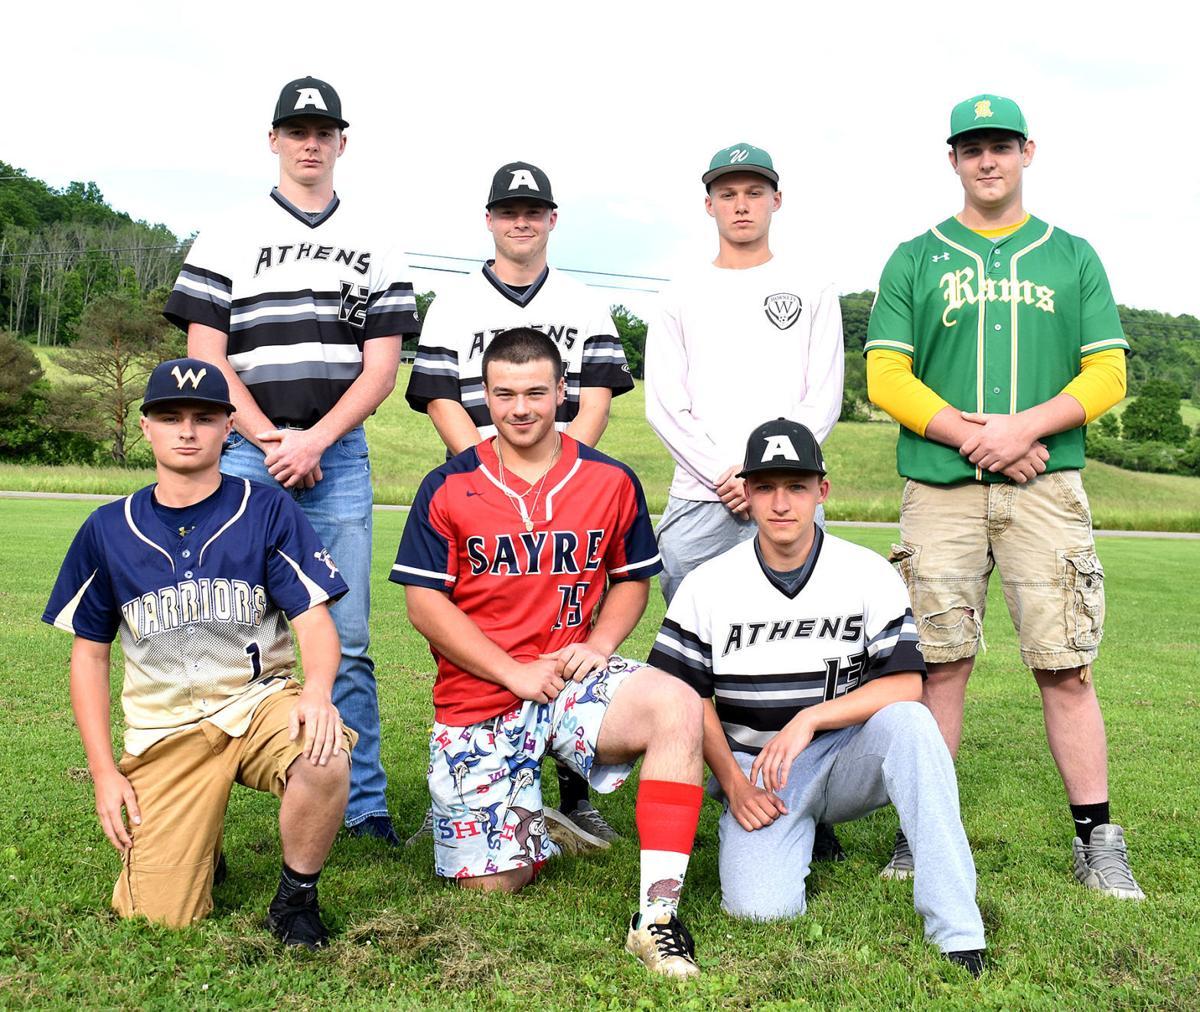 Local players take home main NTL baseball awards